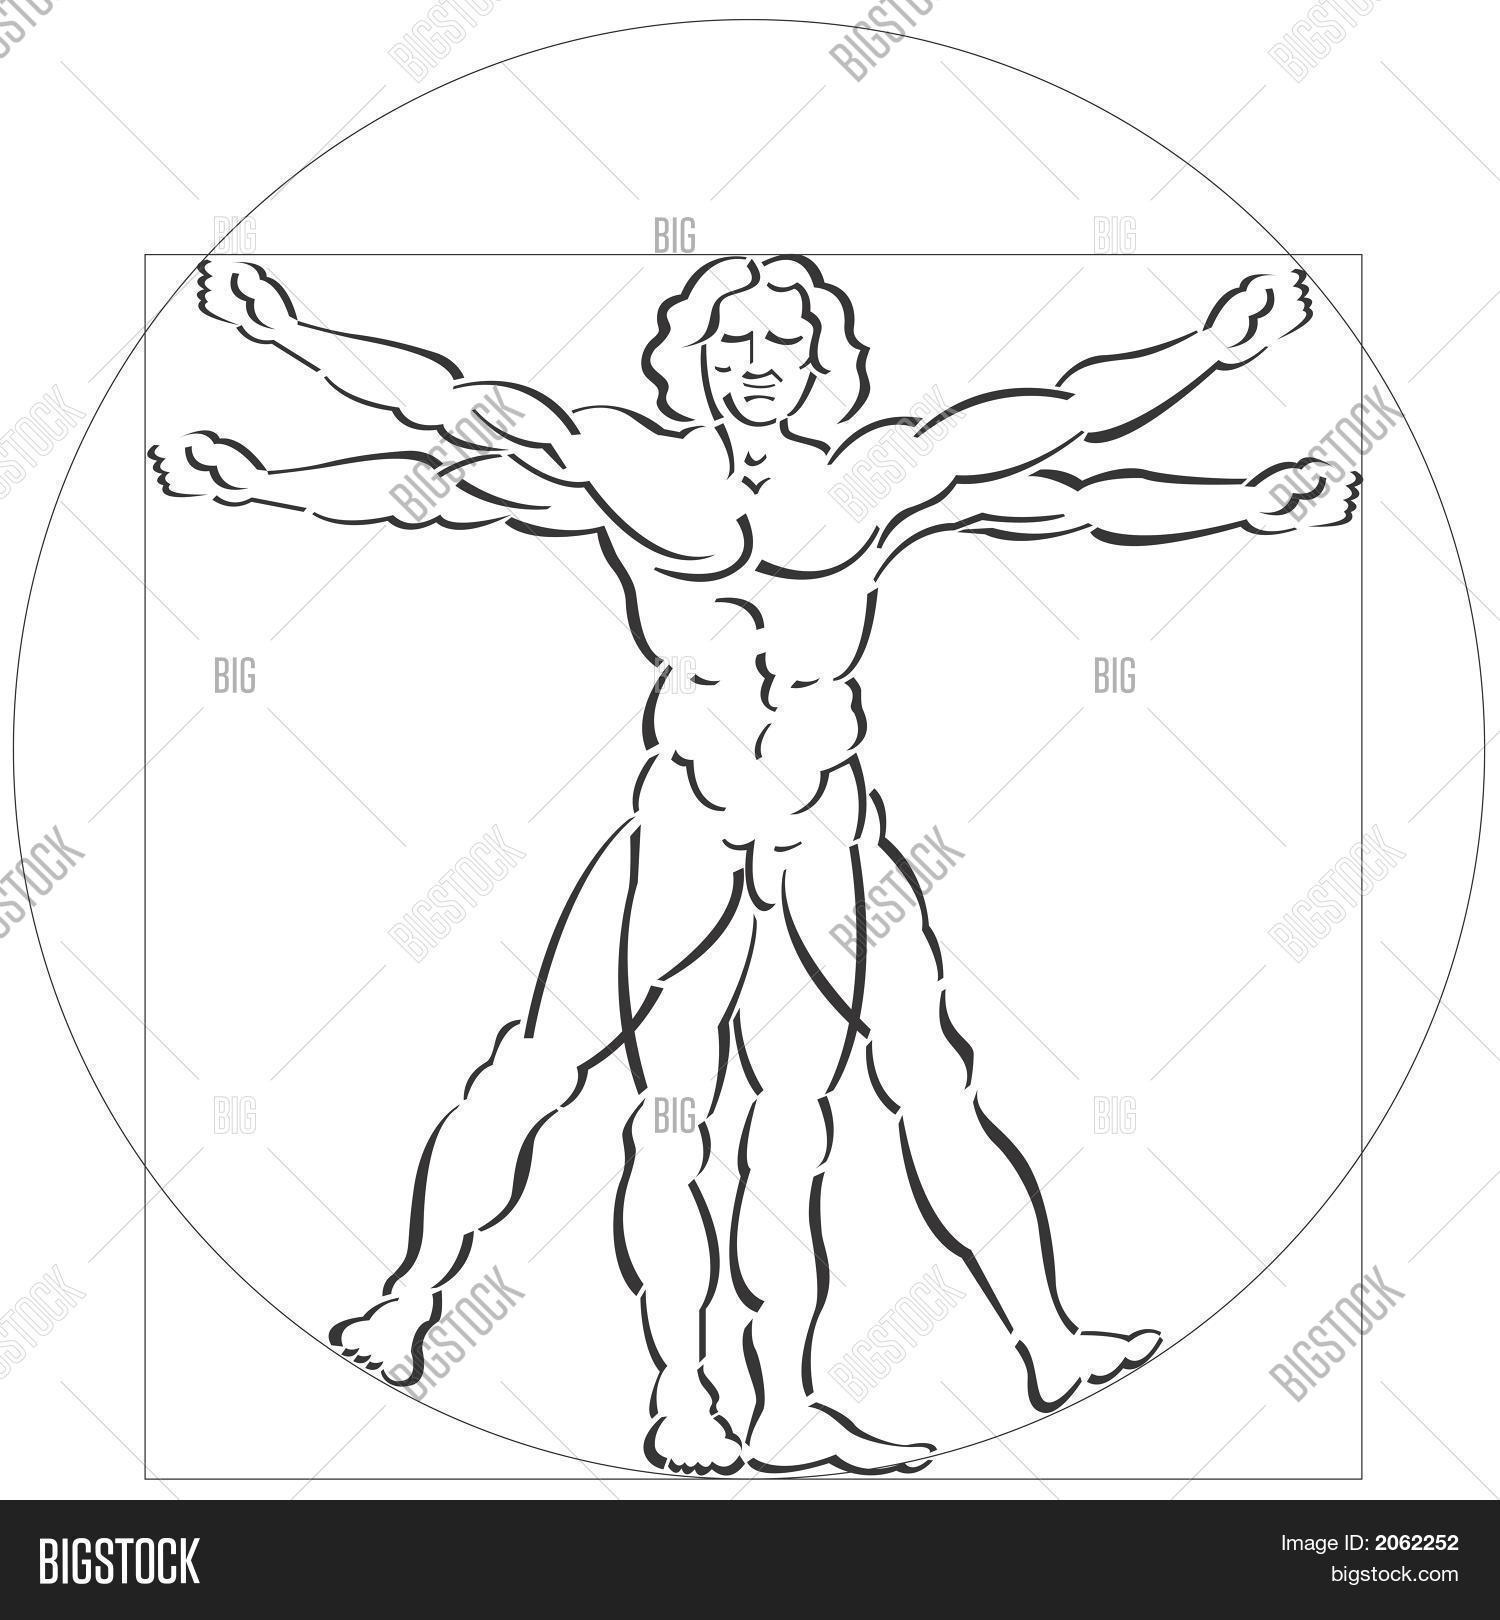 Vitruvian Man Vector & Photo (Free Trial) | Bigstock